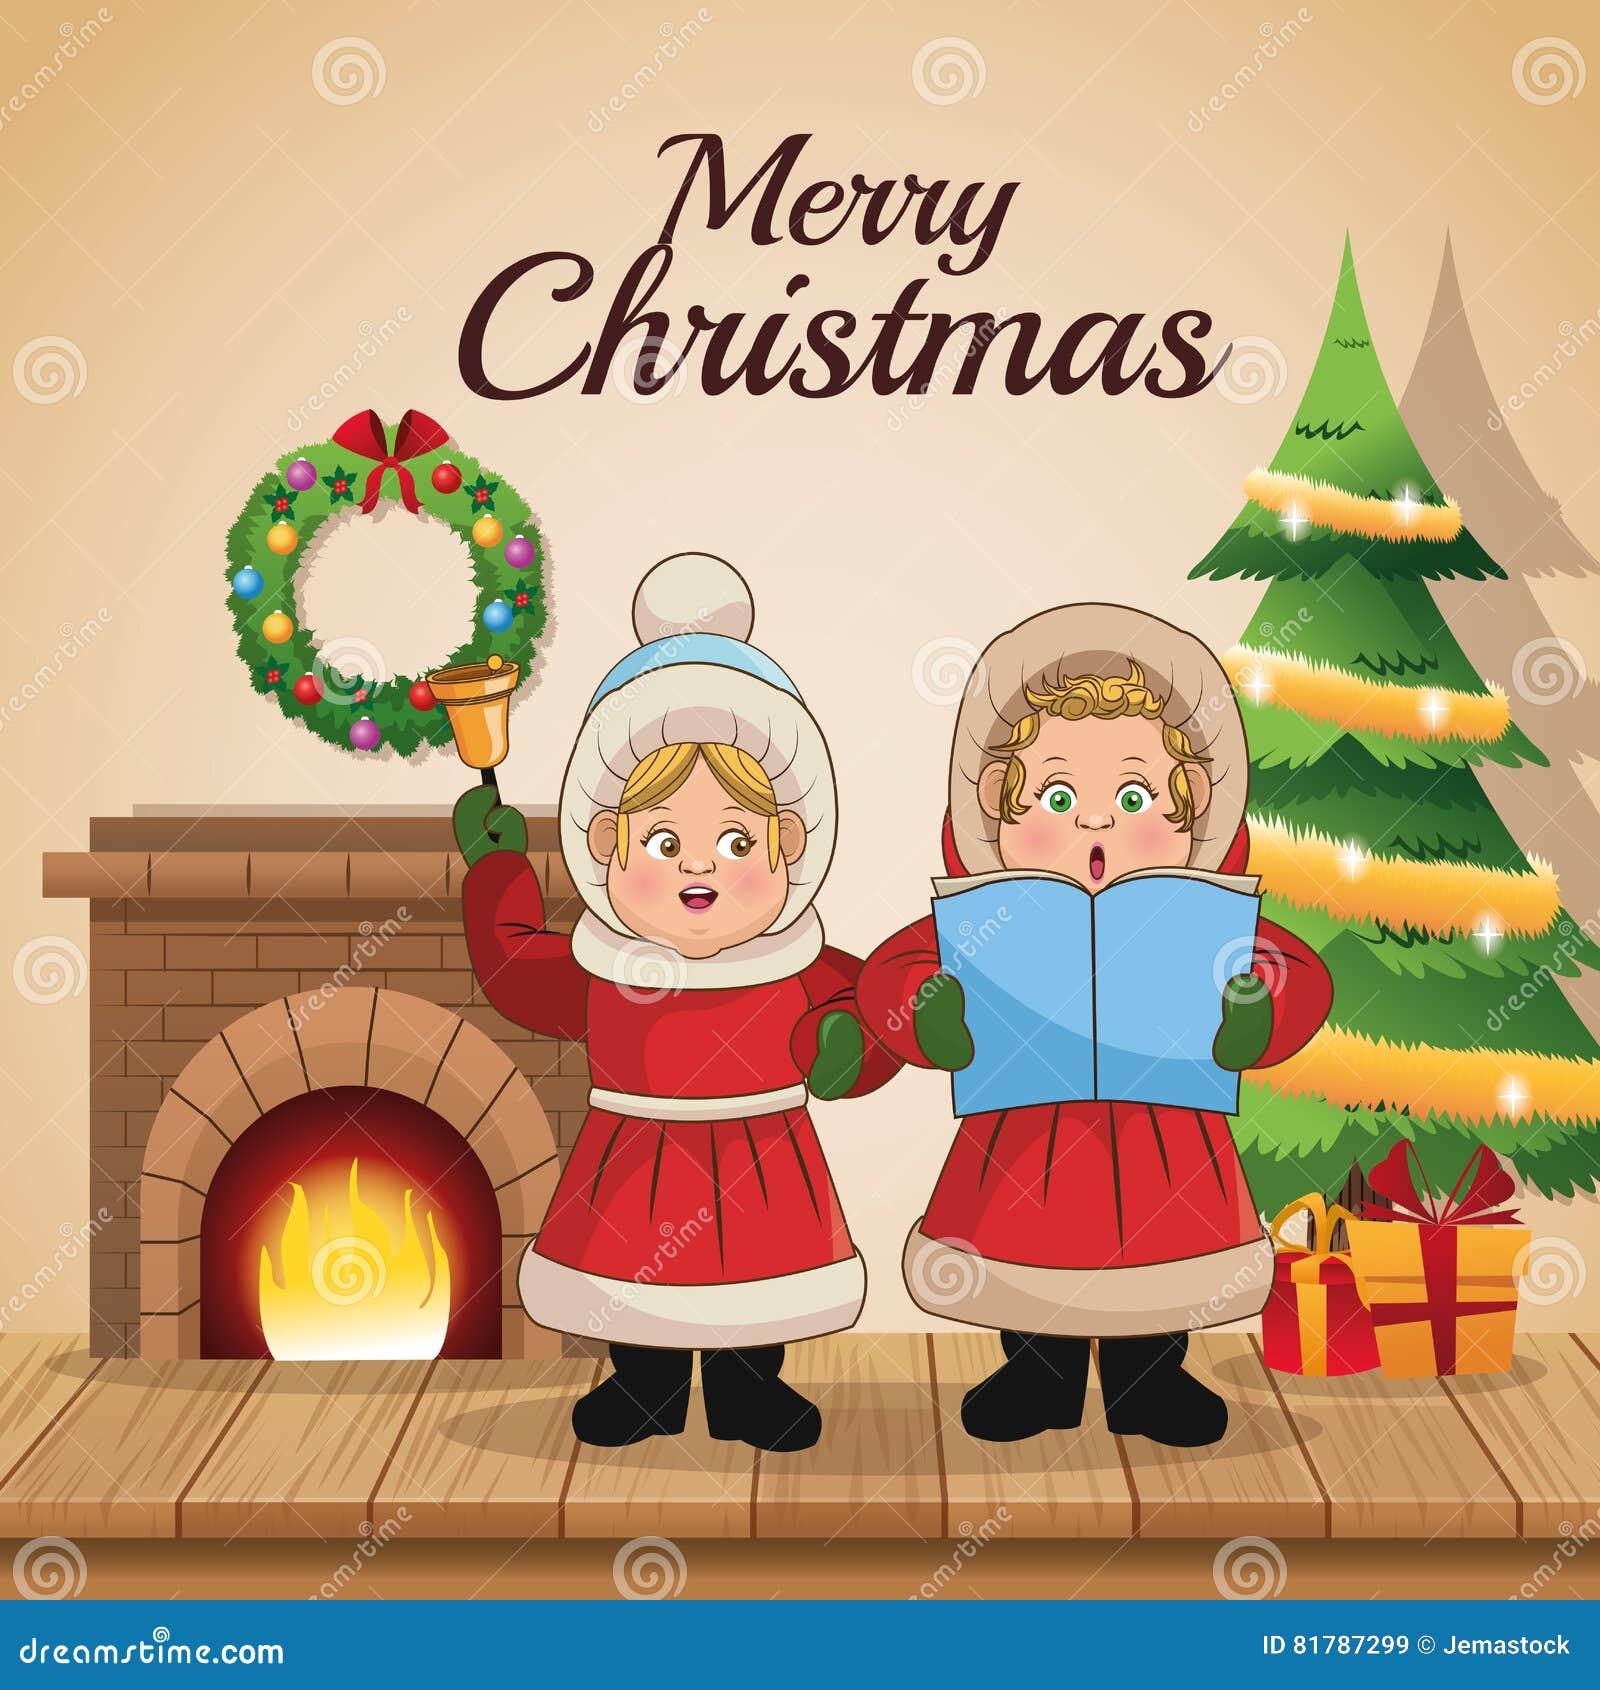 Christmas Carol Singers Decorations: Christmas Carol Singing Decorations